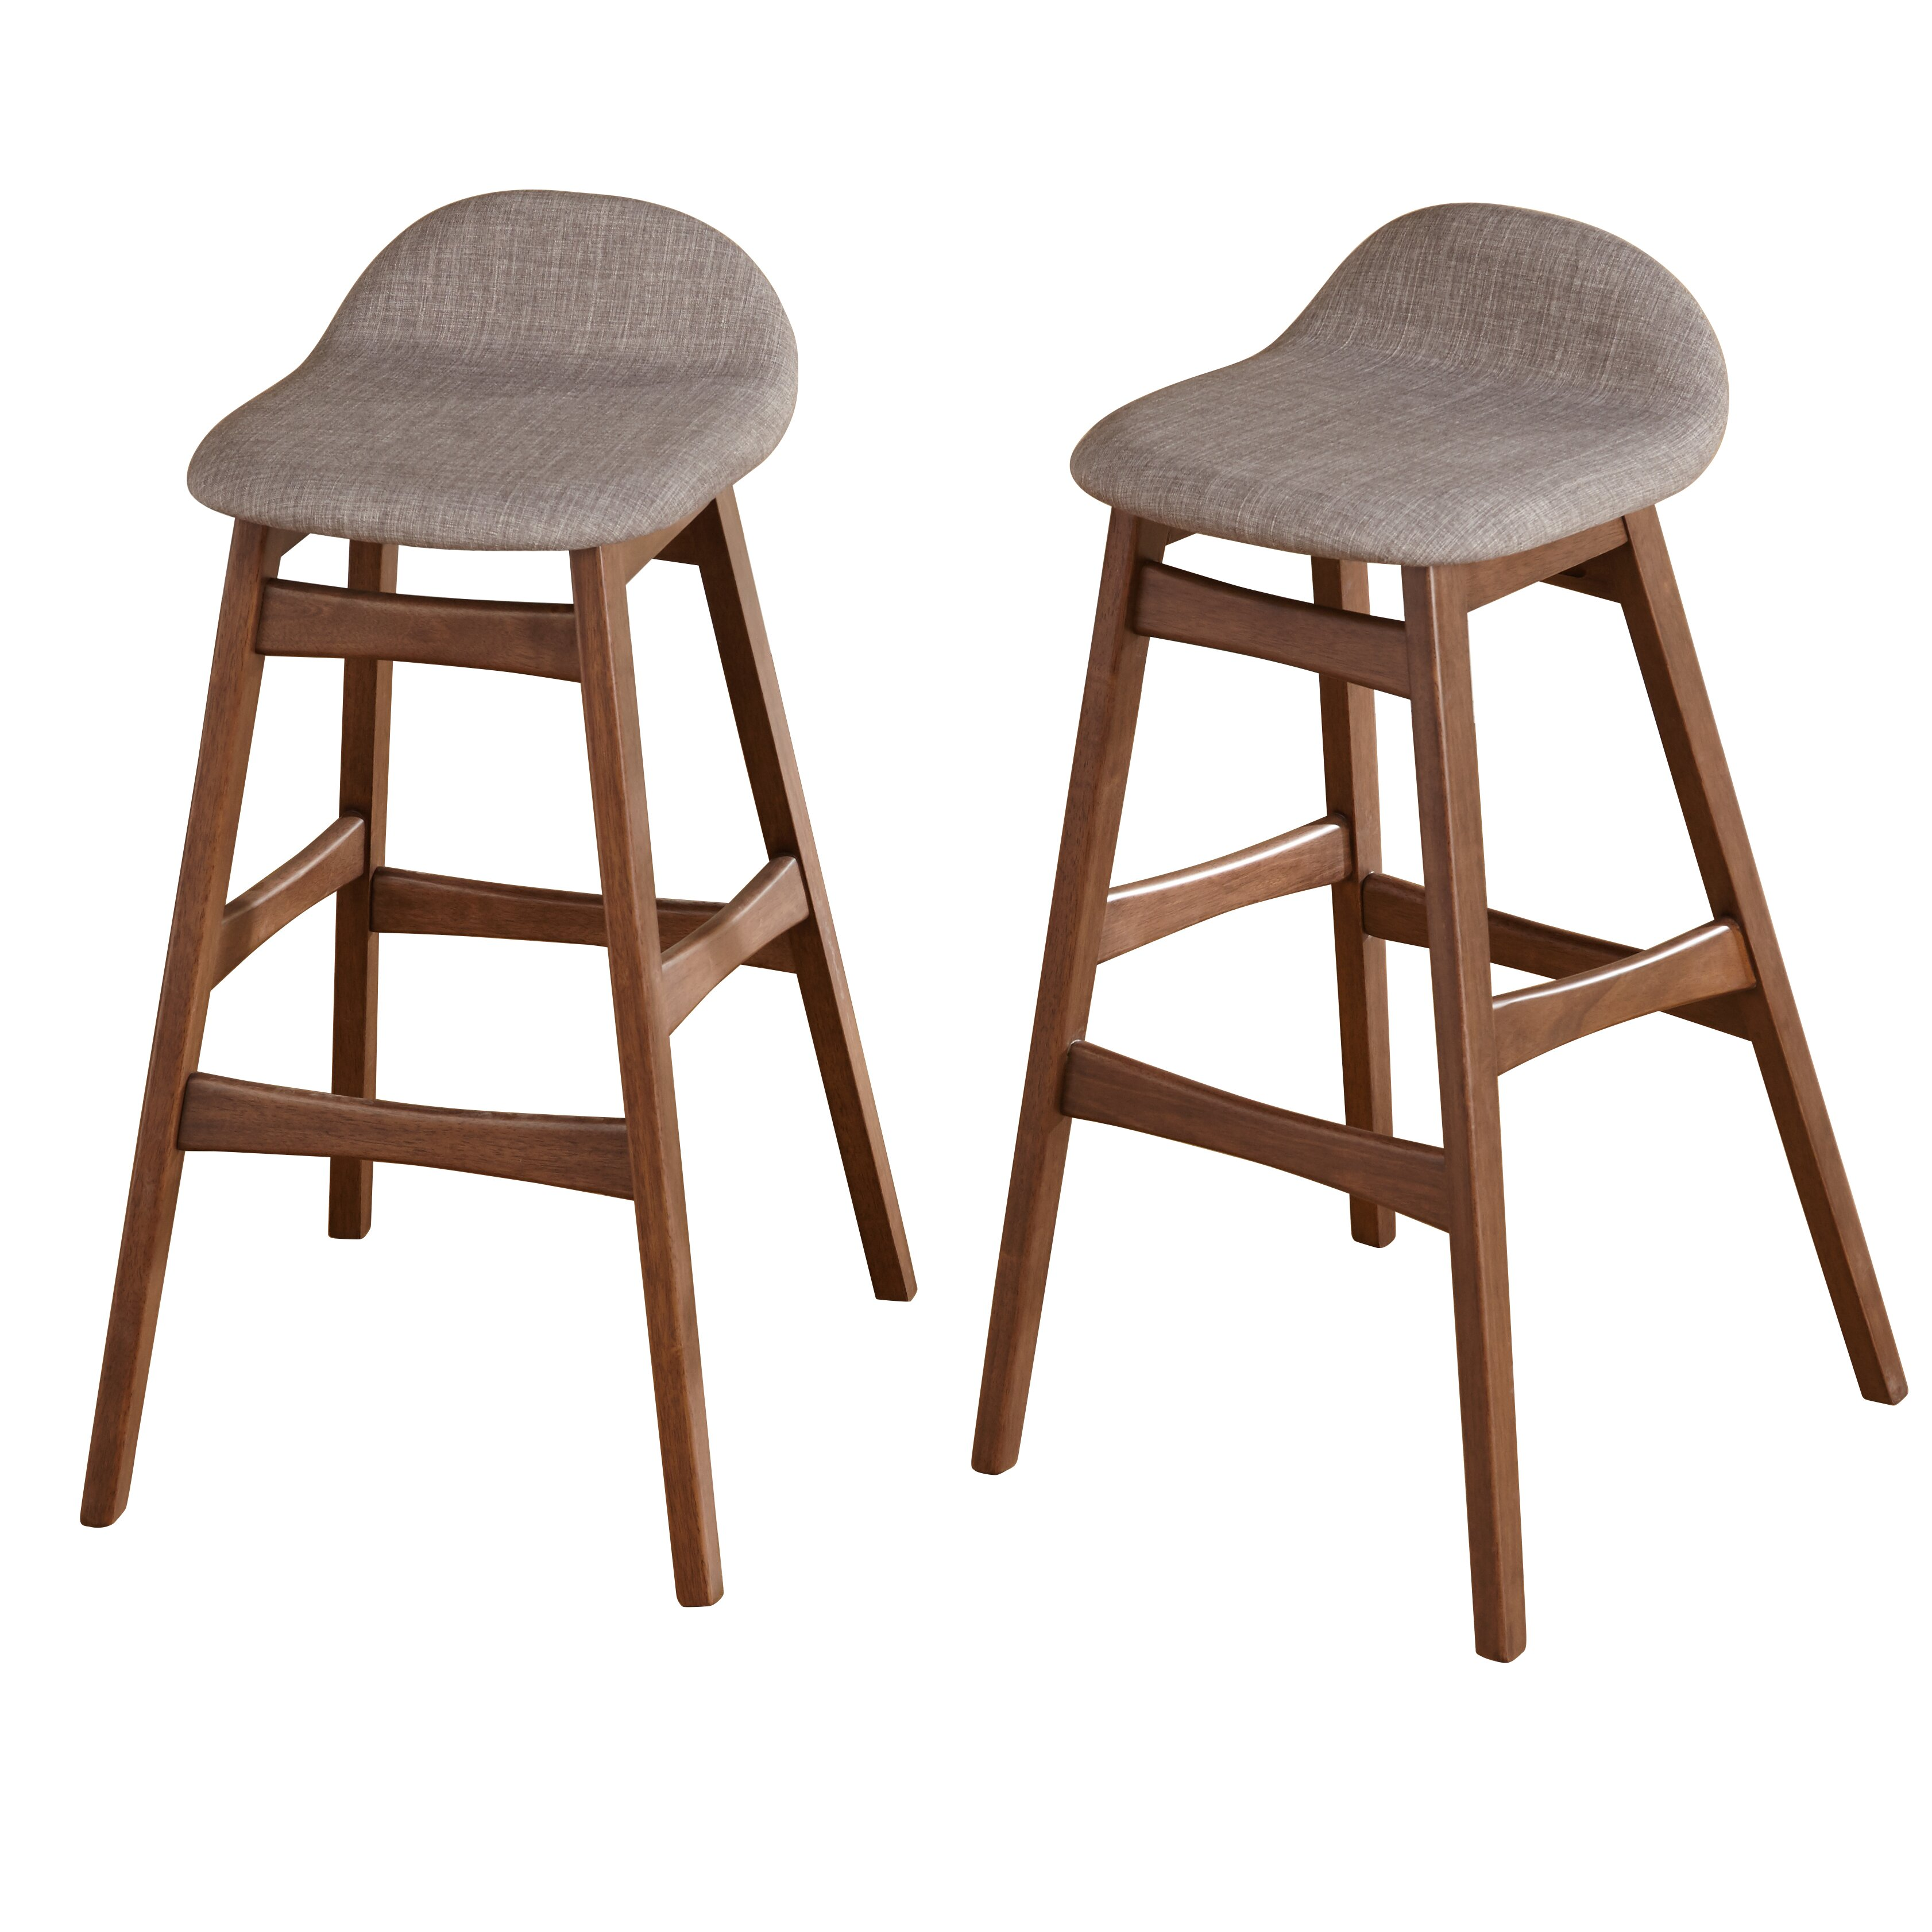 langley street conquistador 5 piece pub table set wayfair. Black Bedroom Furniture Sets. Home Design Ideas